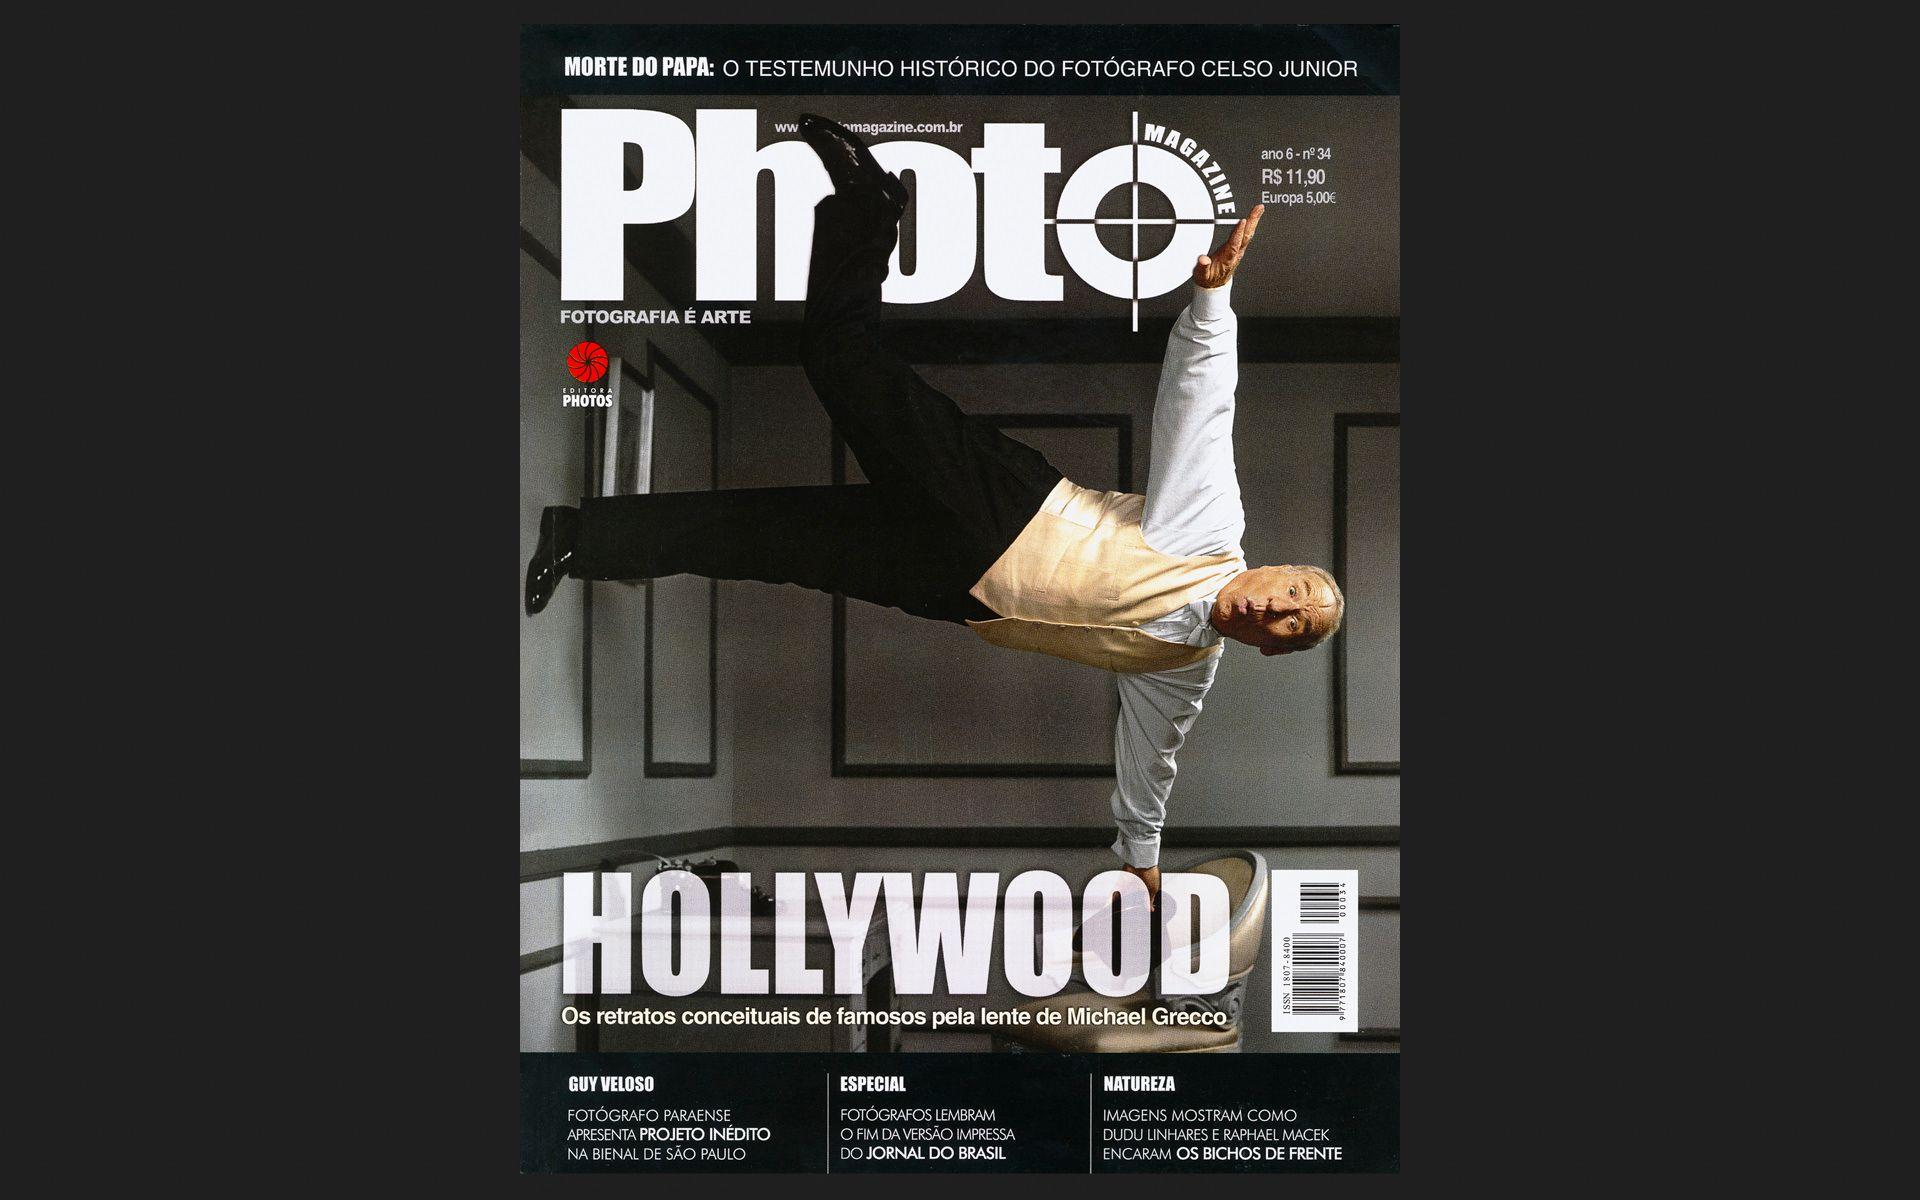 Los-Angeles-Celebrity-Photographer.jpg